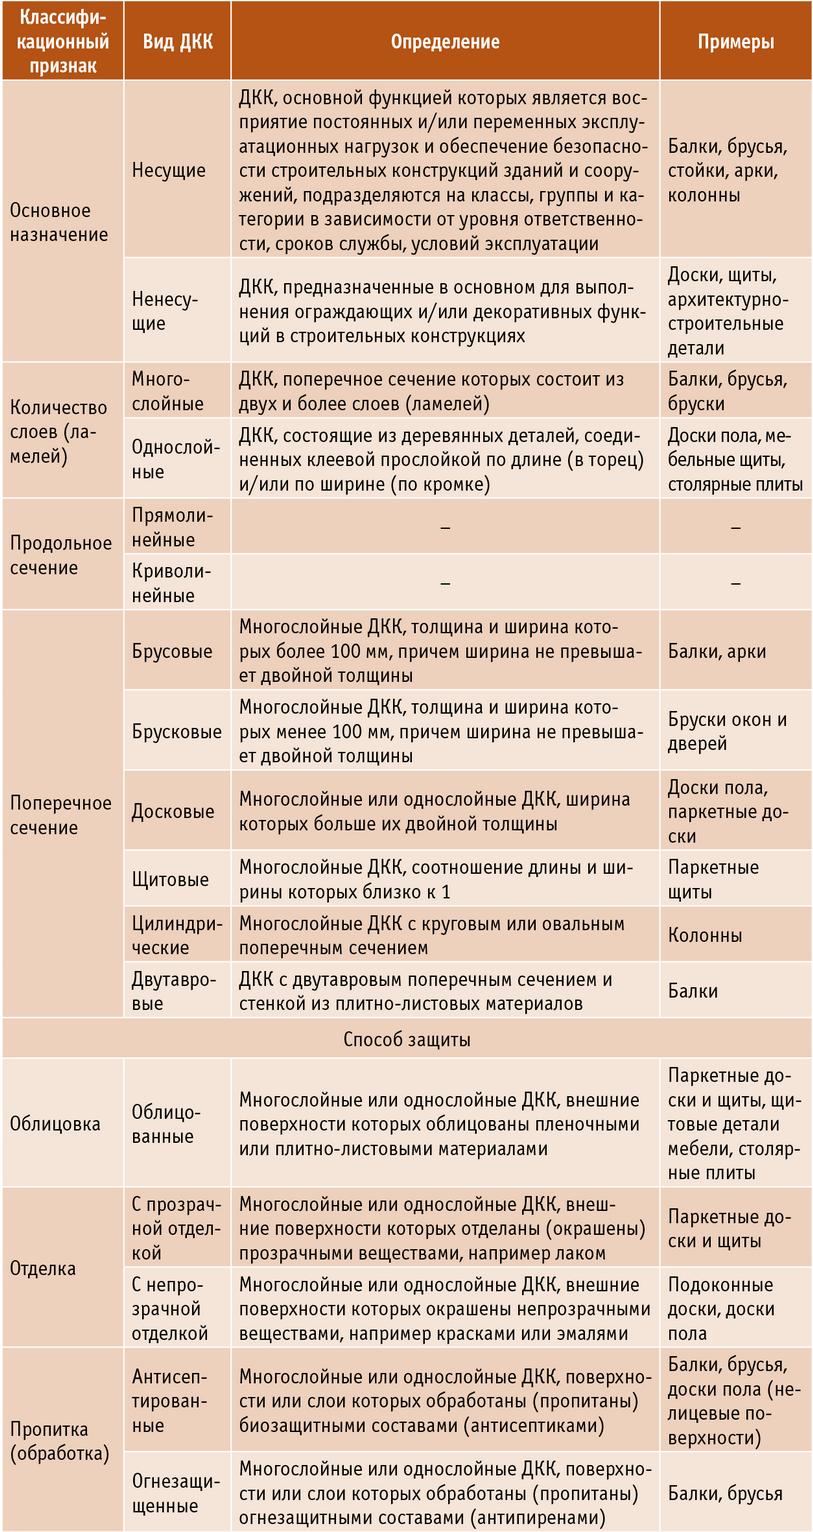 Таблица 2. Классификация ДКК